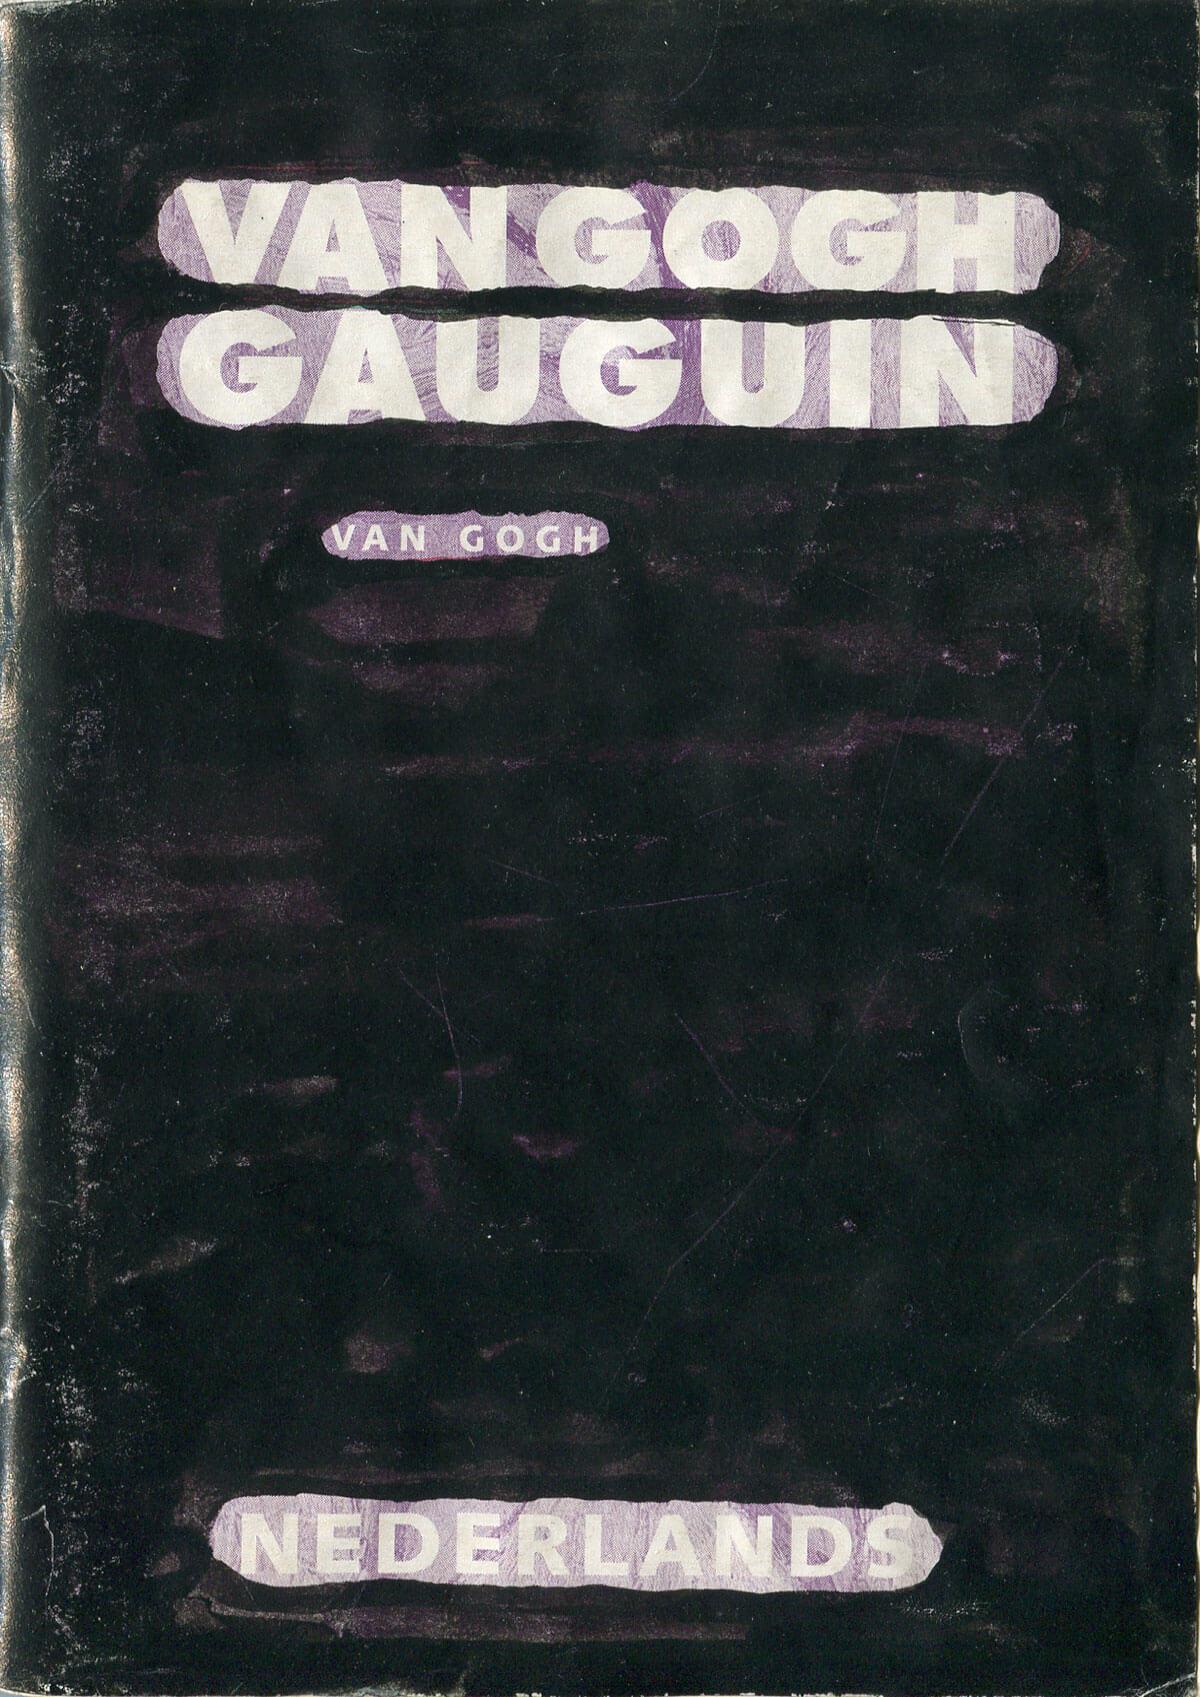 Van Gogh&Gauguin: Characteristics, Dutch version, cover, 15 x 10.4 cm, 2002